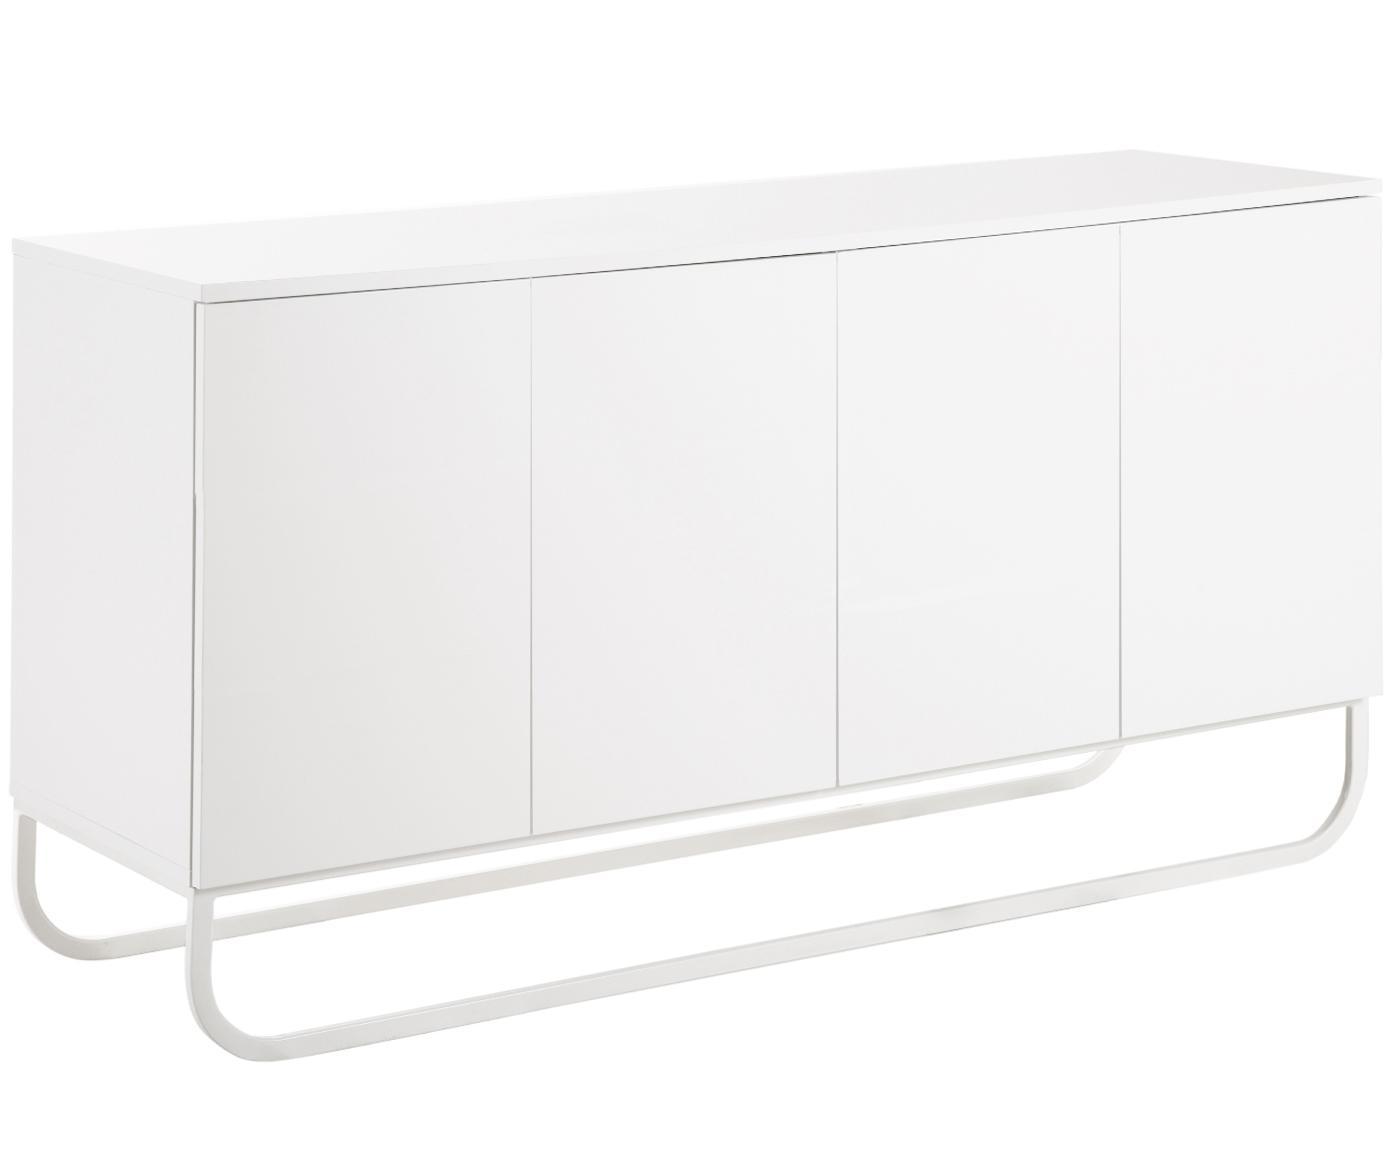 Klassisches Sideboard Sanford in Weiss, Korpus: Mitteldichte Holzfaserpla, Korpus: Weiss, mattFussgestell: Weiss, matt, 160 x 83 cm